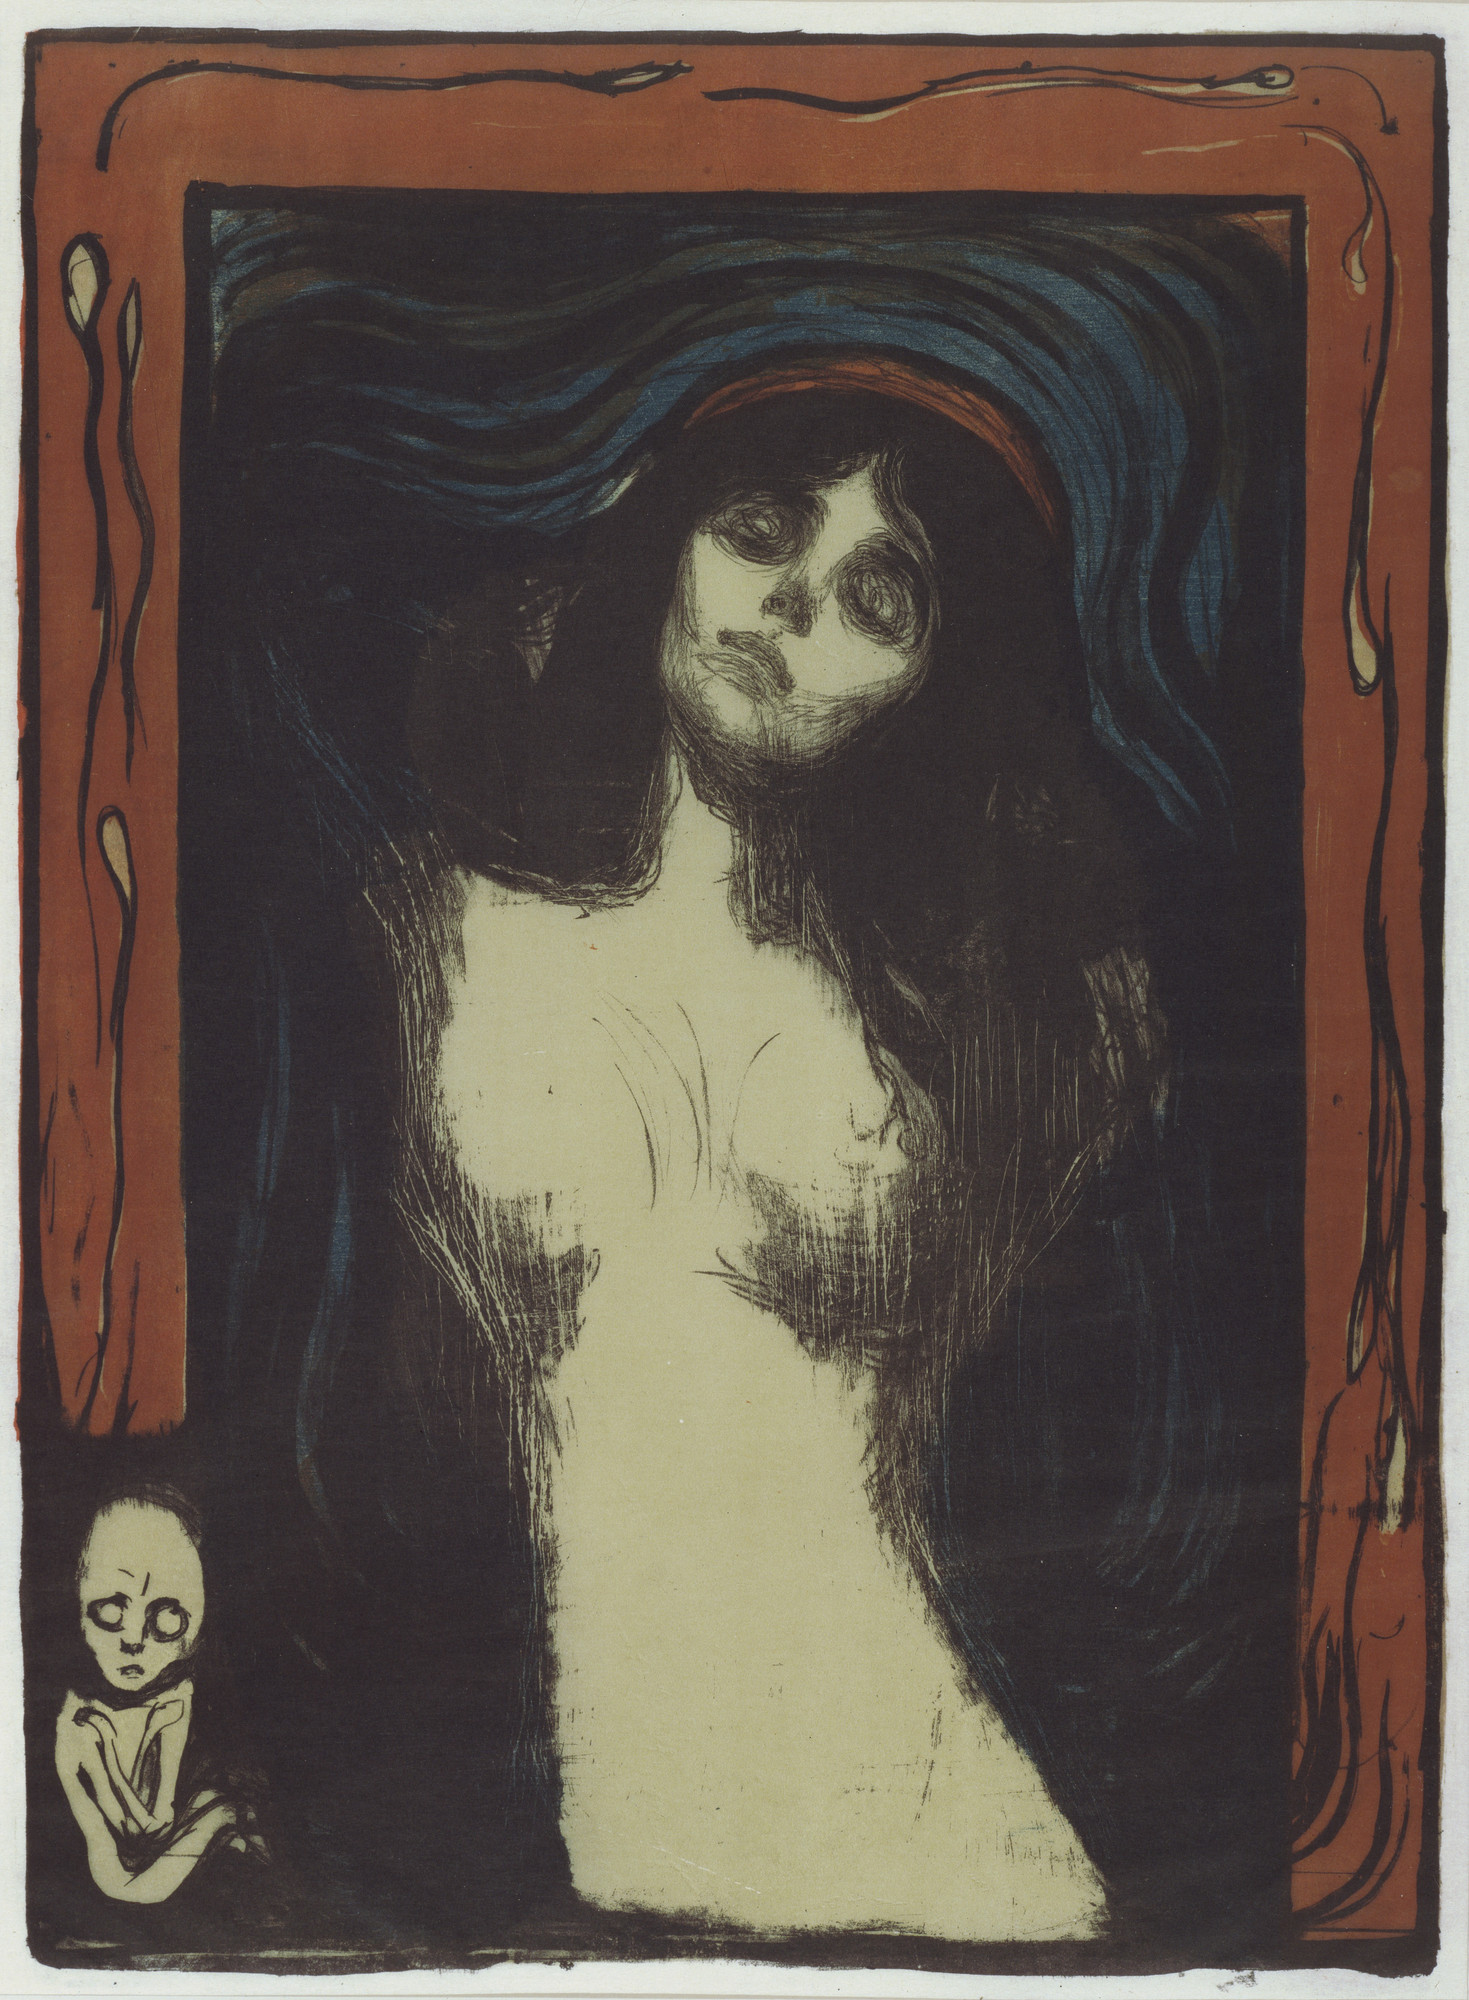 Symbolism moma edvard munch madonna 18951902 biocorpaavc Images